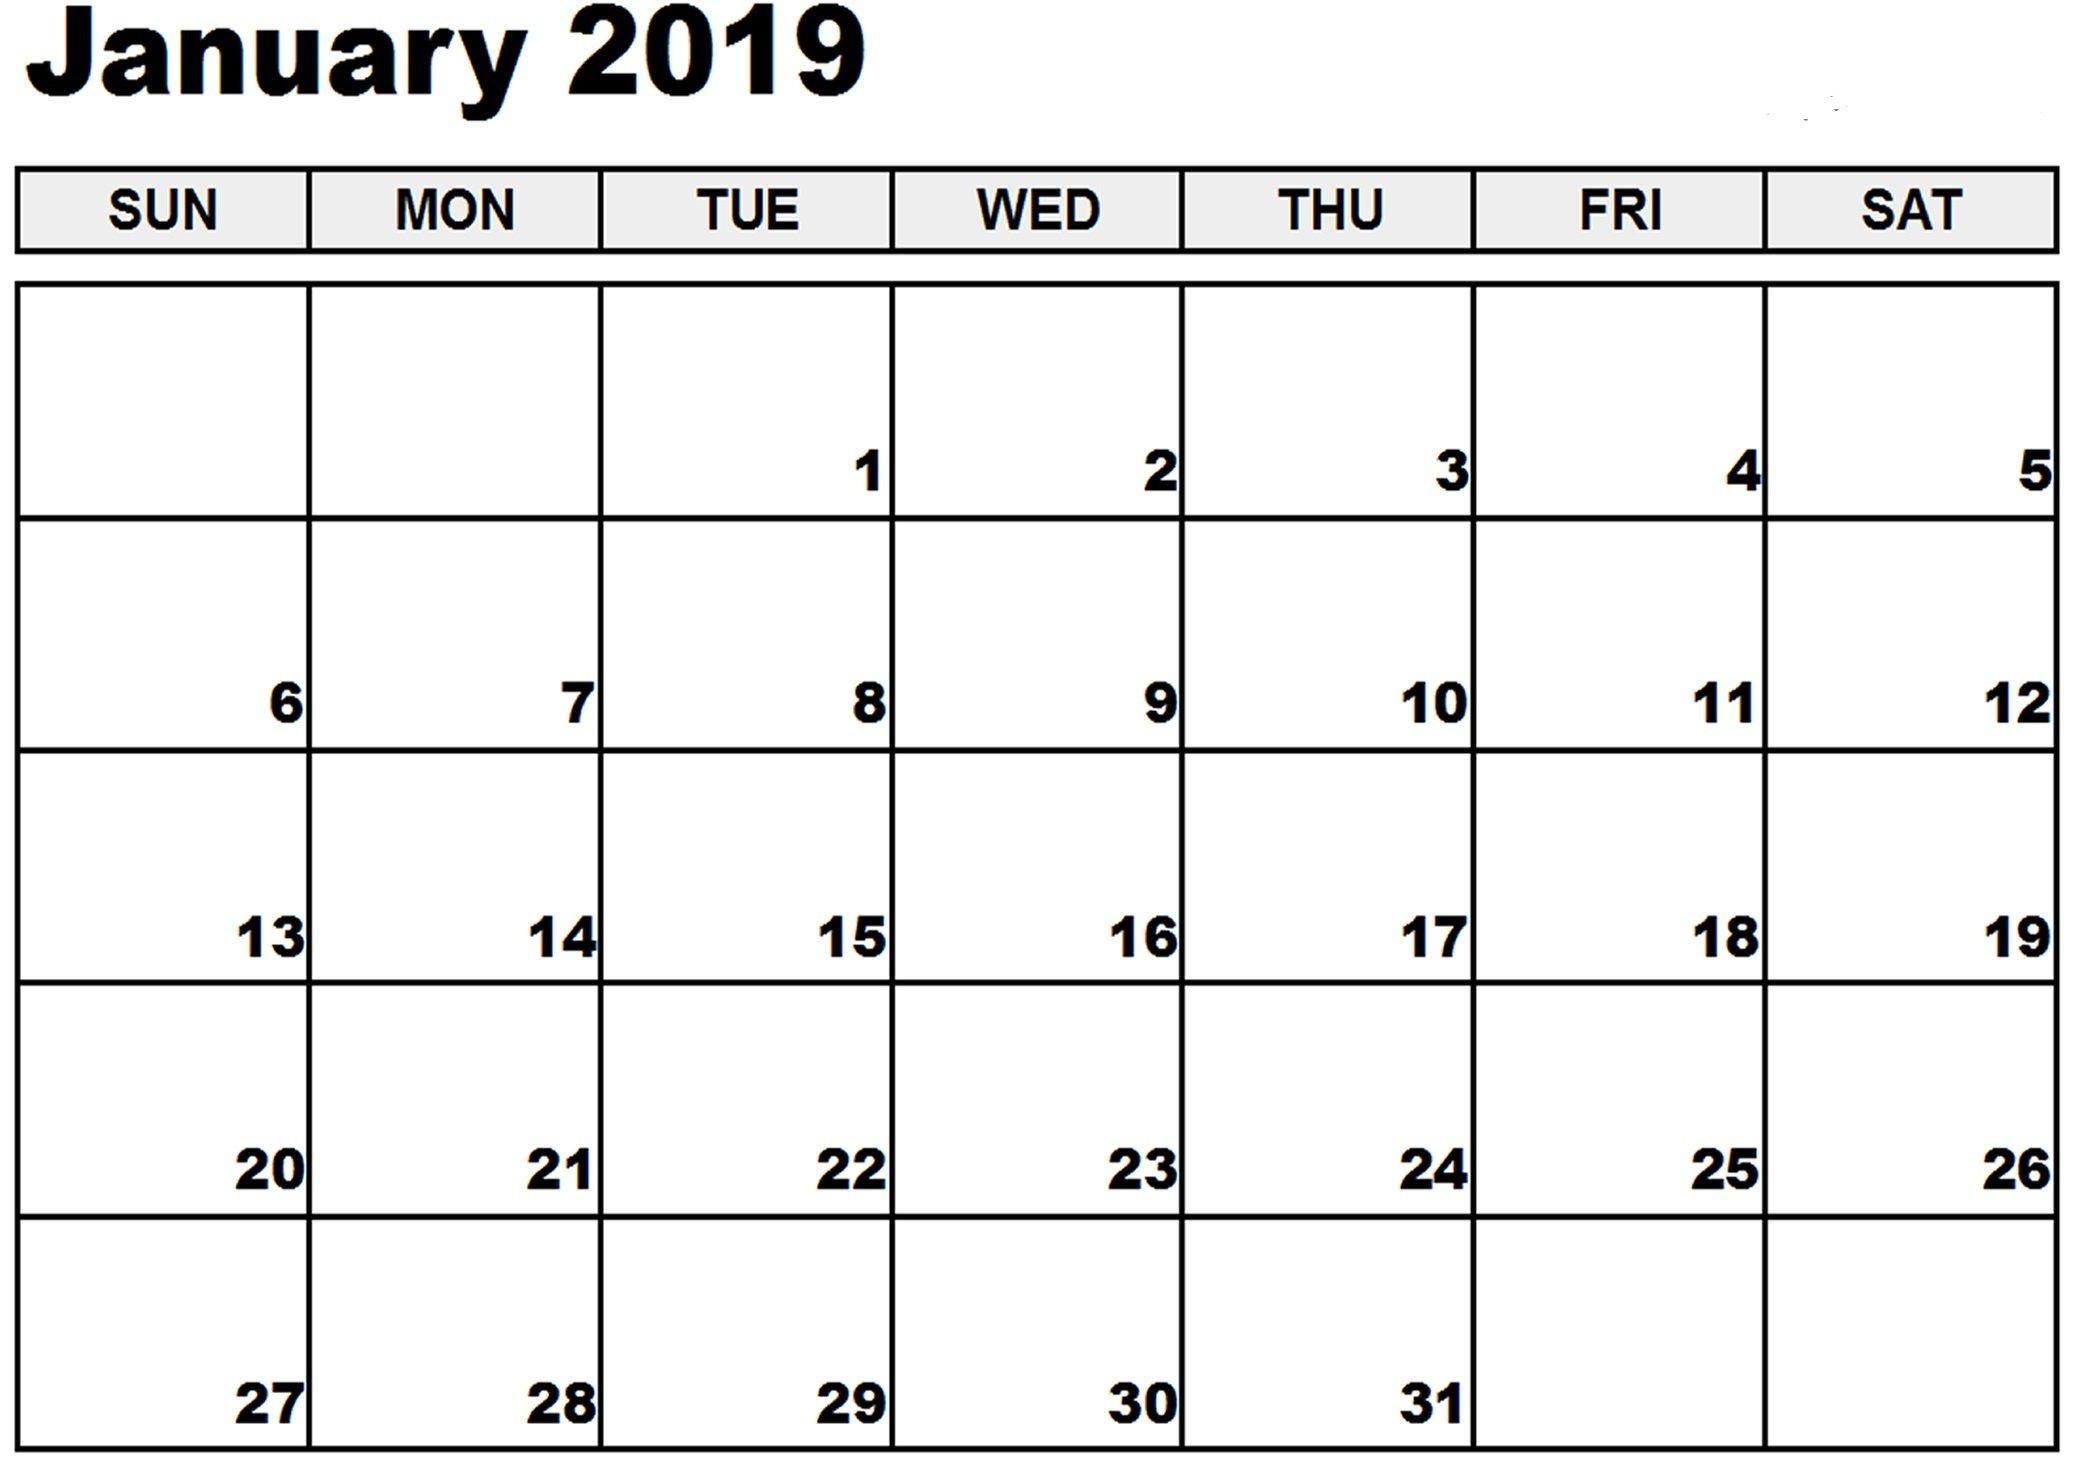 January 2019 Calendar Victoria Free Printable Words Calendar 2019 Victoria